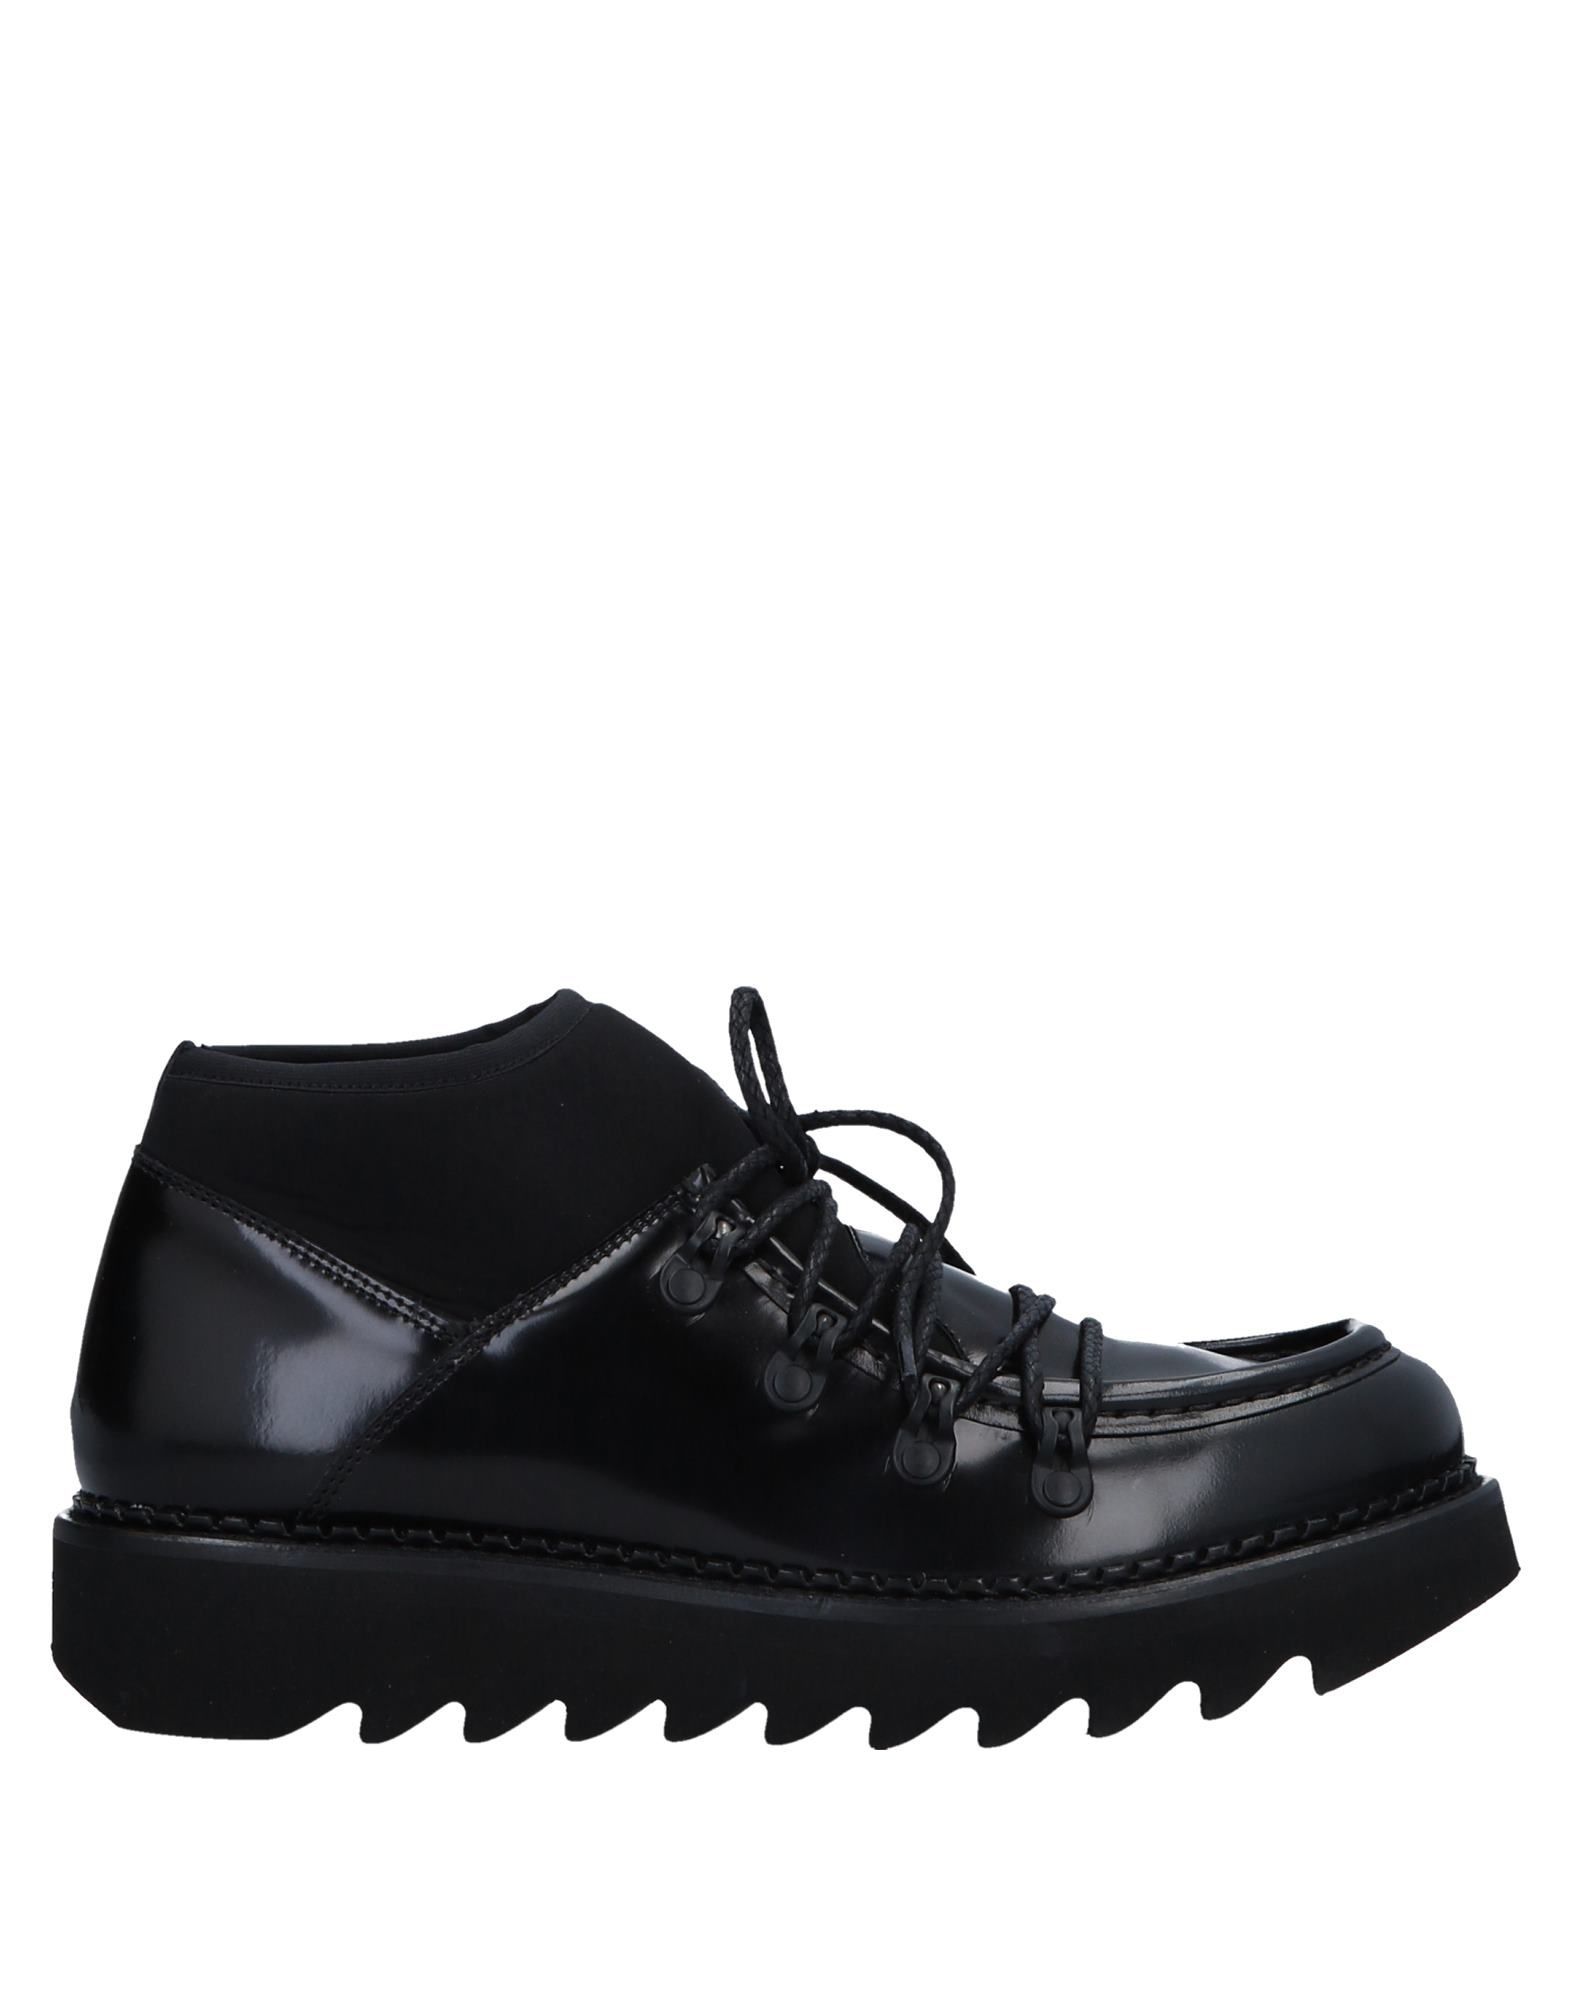 Alberto Guardiani Ankle Guardiani Boot - Women Alberto Guardiani Ankle Ankle Boots online on  United Kingdom - 11515040AB f70737